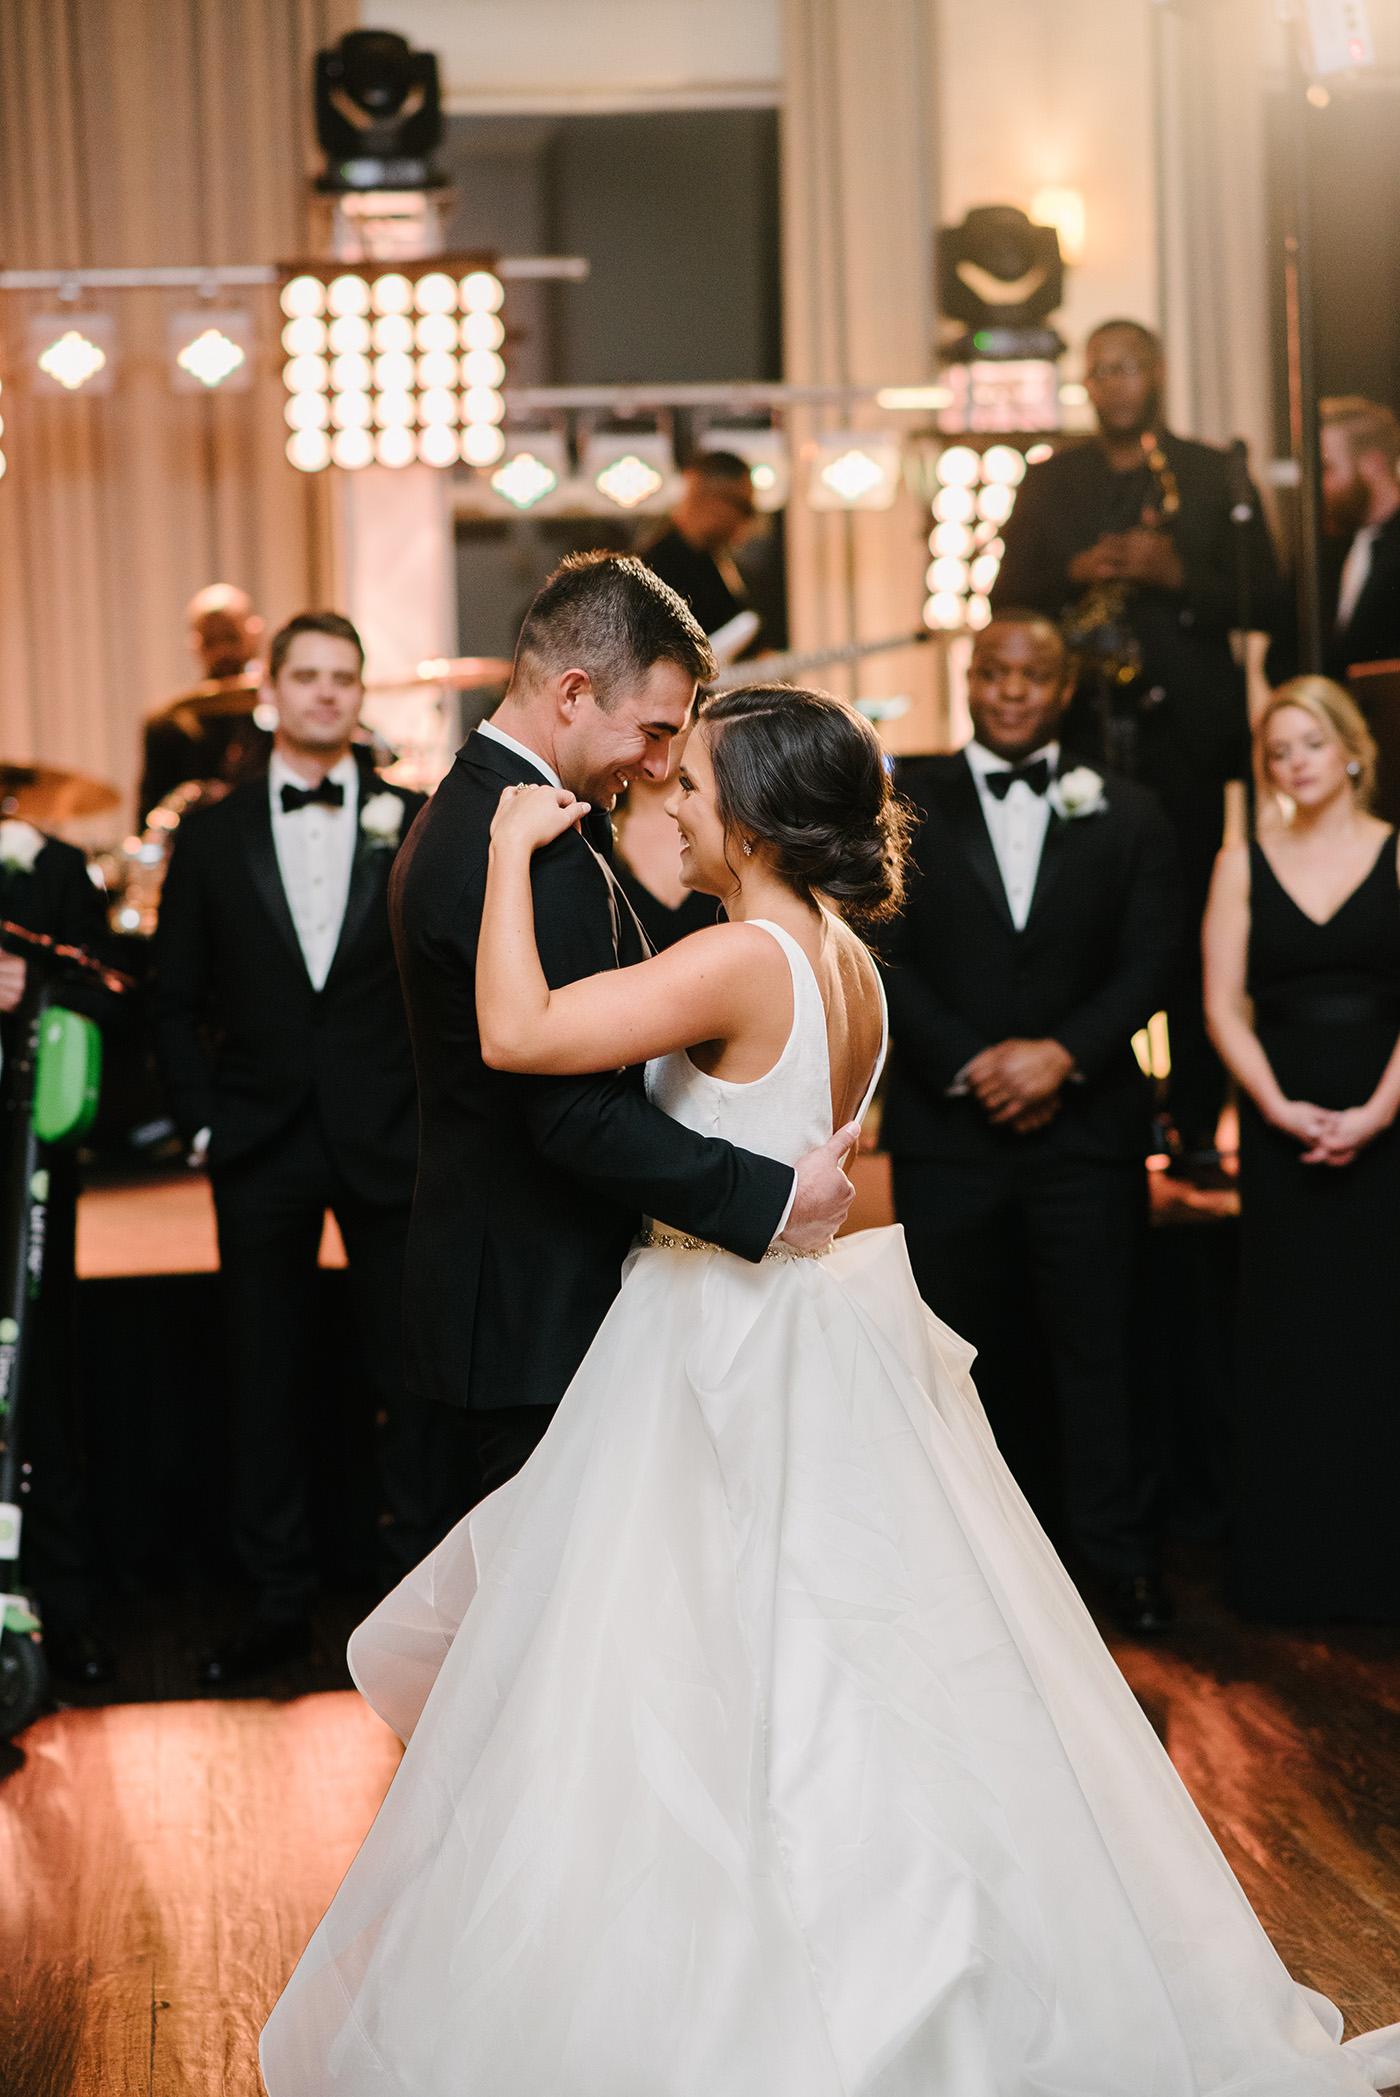 Dallas Wedding Planner - Winter Wedding at The Room on Main - Allday Events - 68.jpg